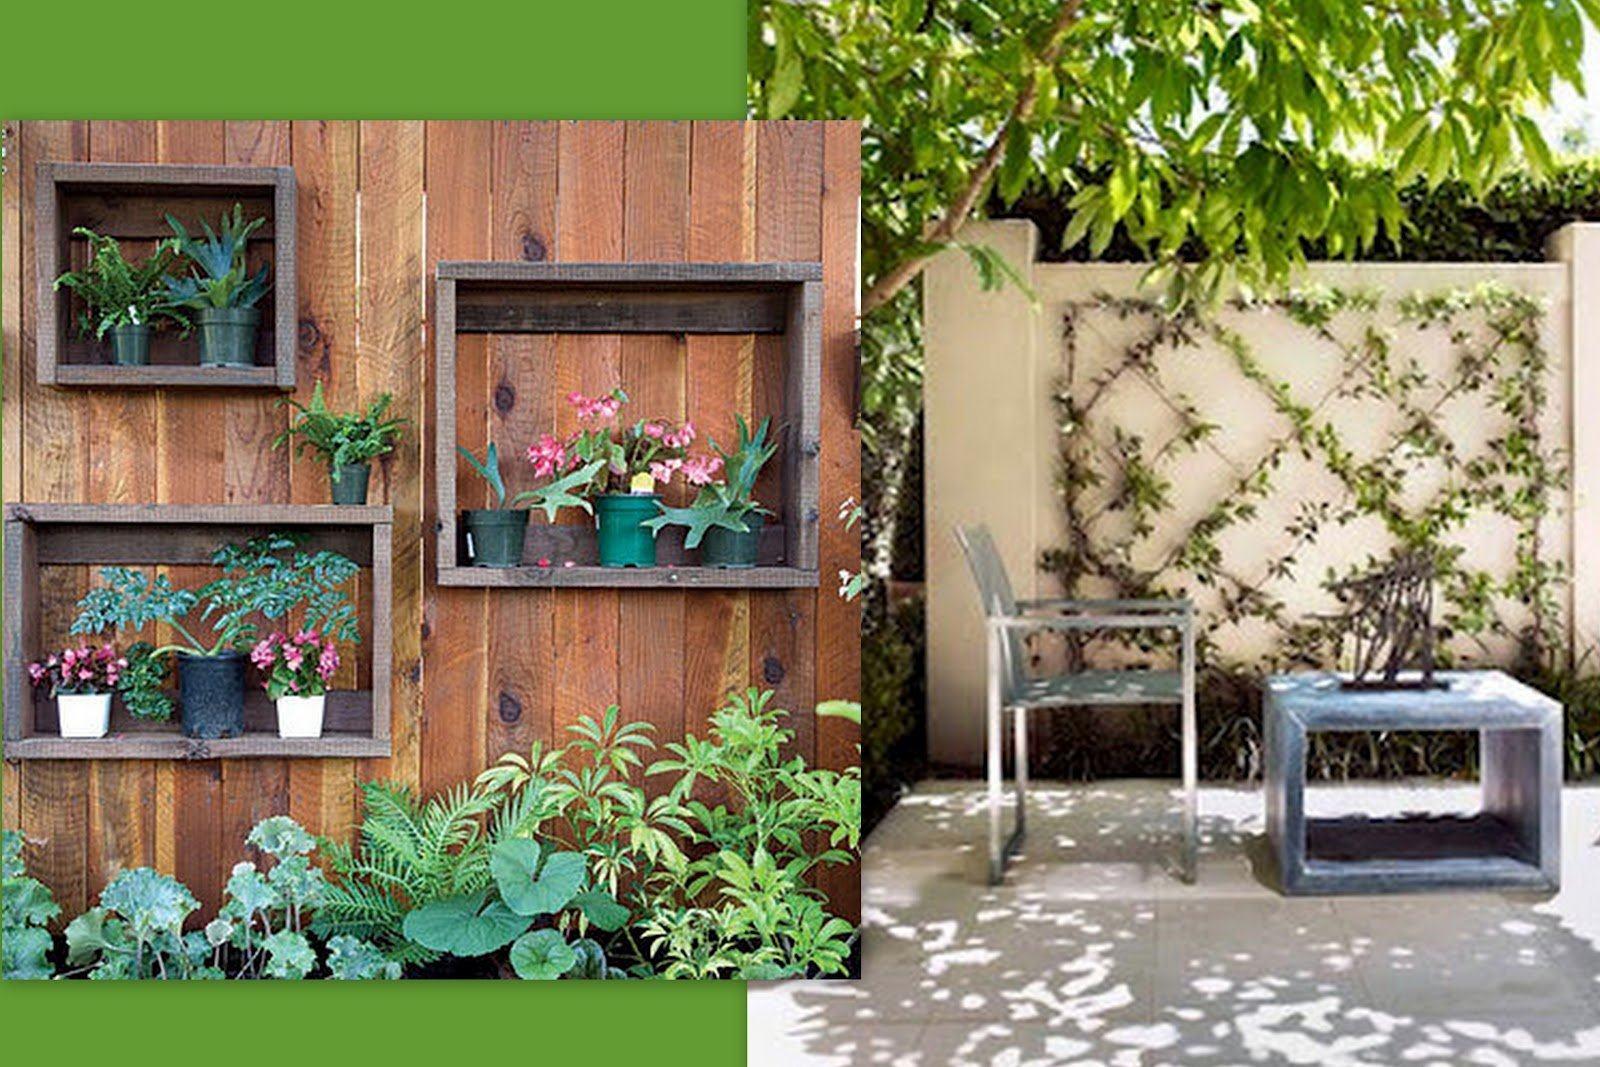 jardim vertical fotos : jardim vertical fotos:Lindas fotos jardim vertical na parede